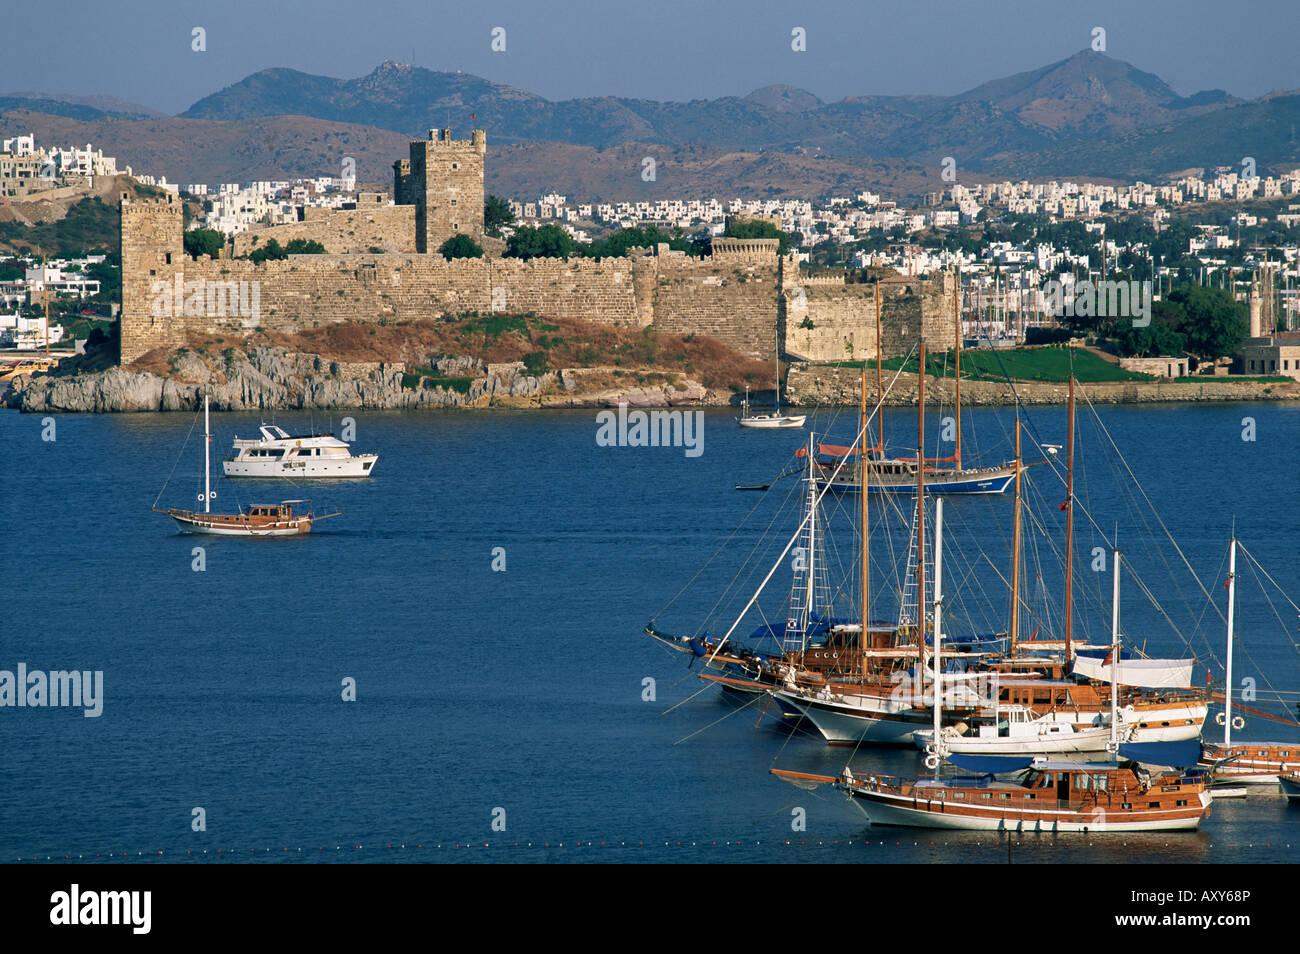 Chateau Saint Pierre, Bodrum, Egee region, Anatolia, Turkey, Asia Minor, Asia - Stock Image